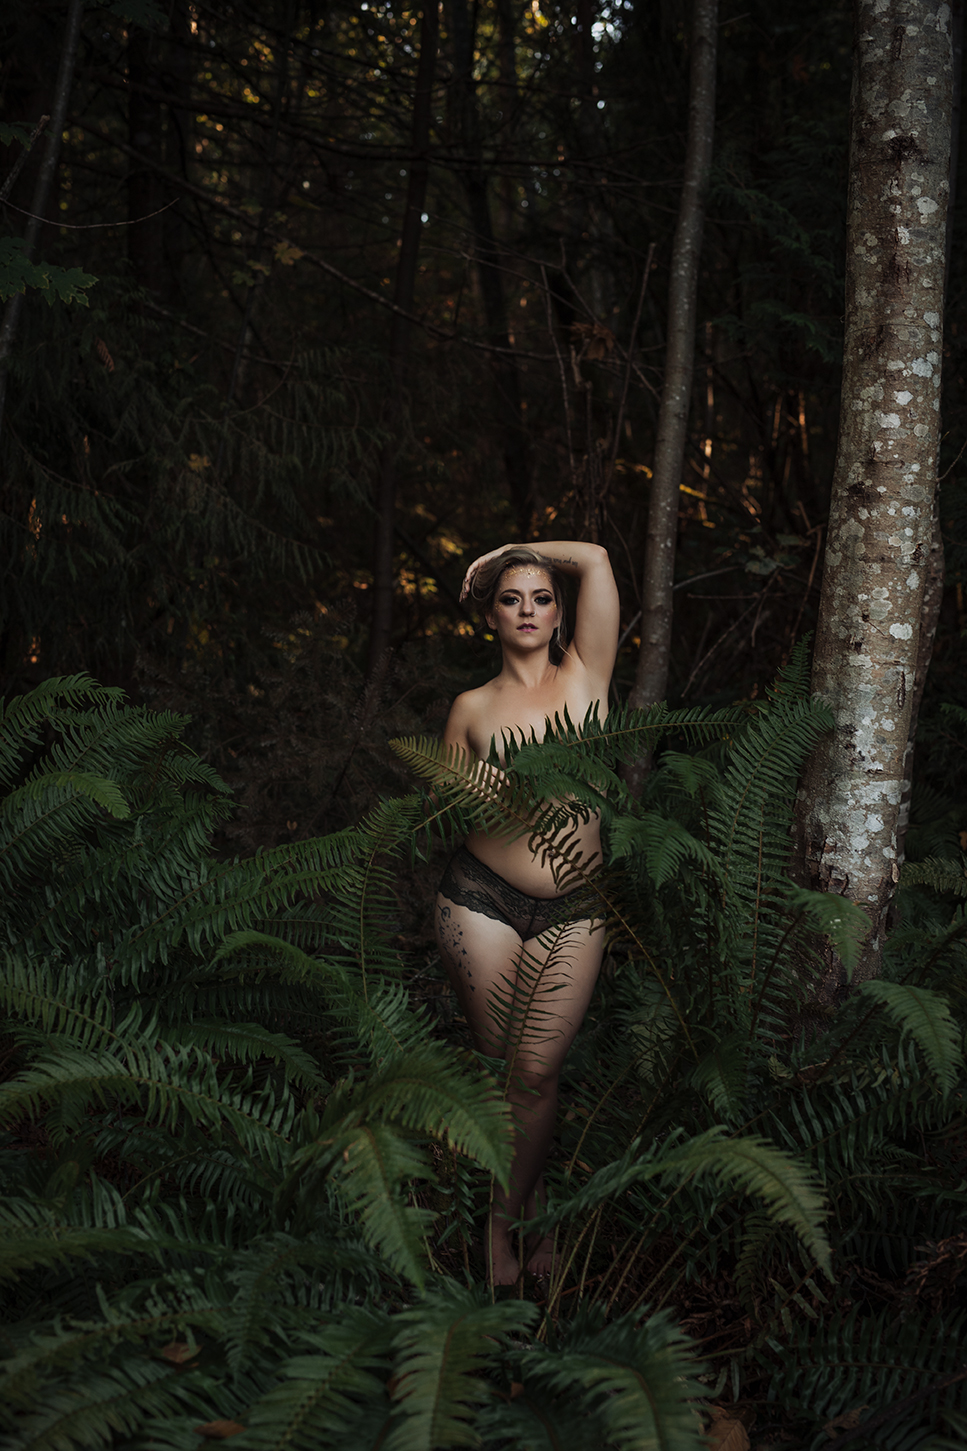 Victoria-BC-Outdoor-Boudoir-Moss-Photography-130.jpg